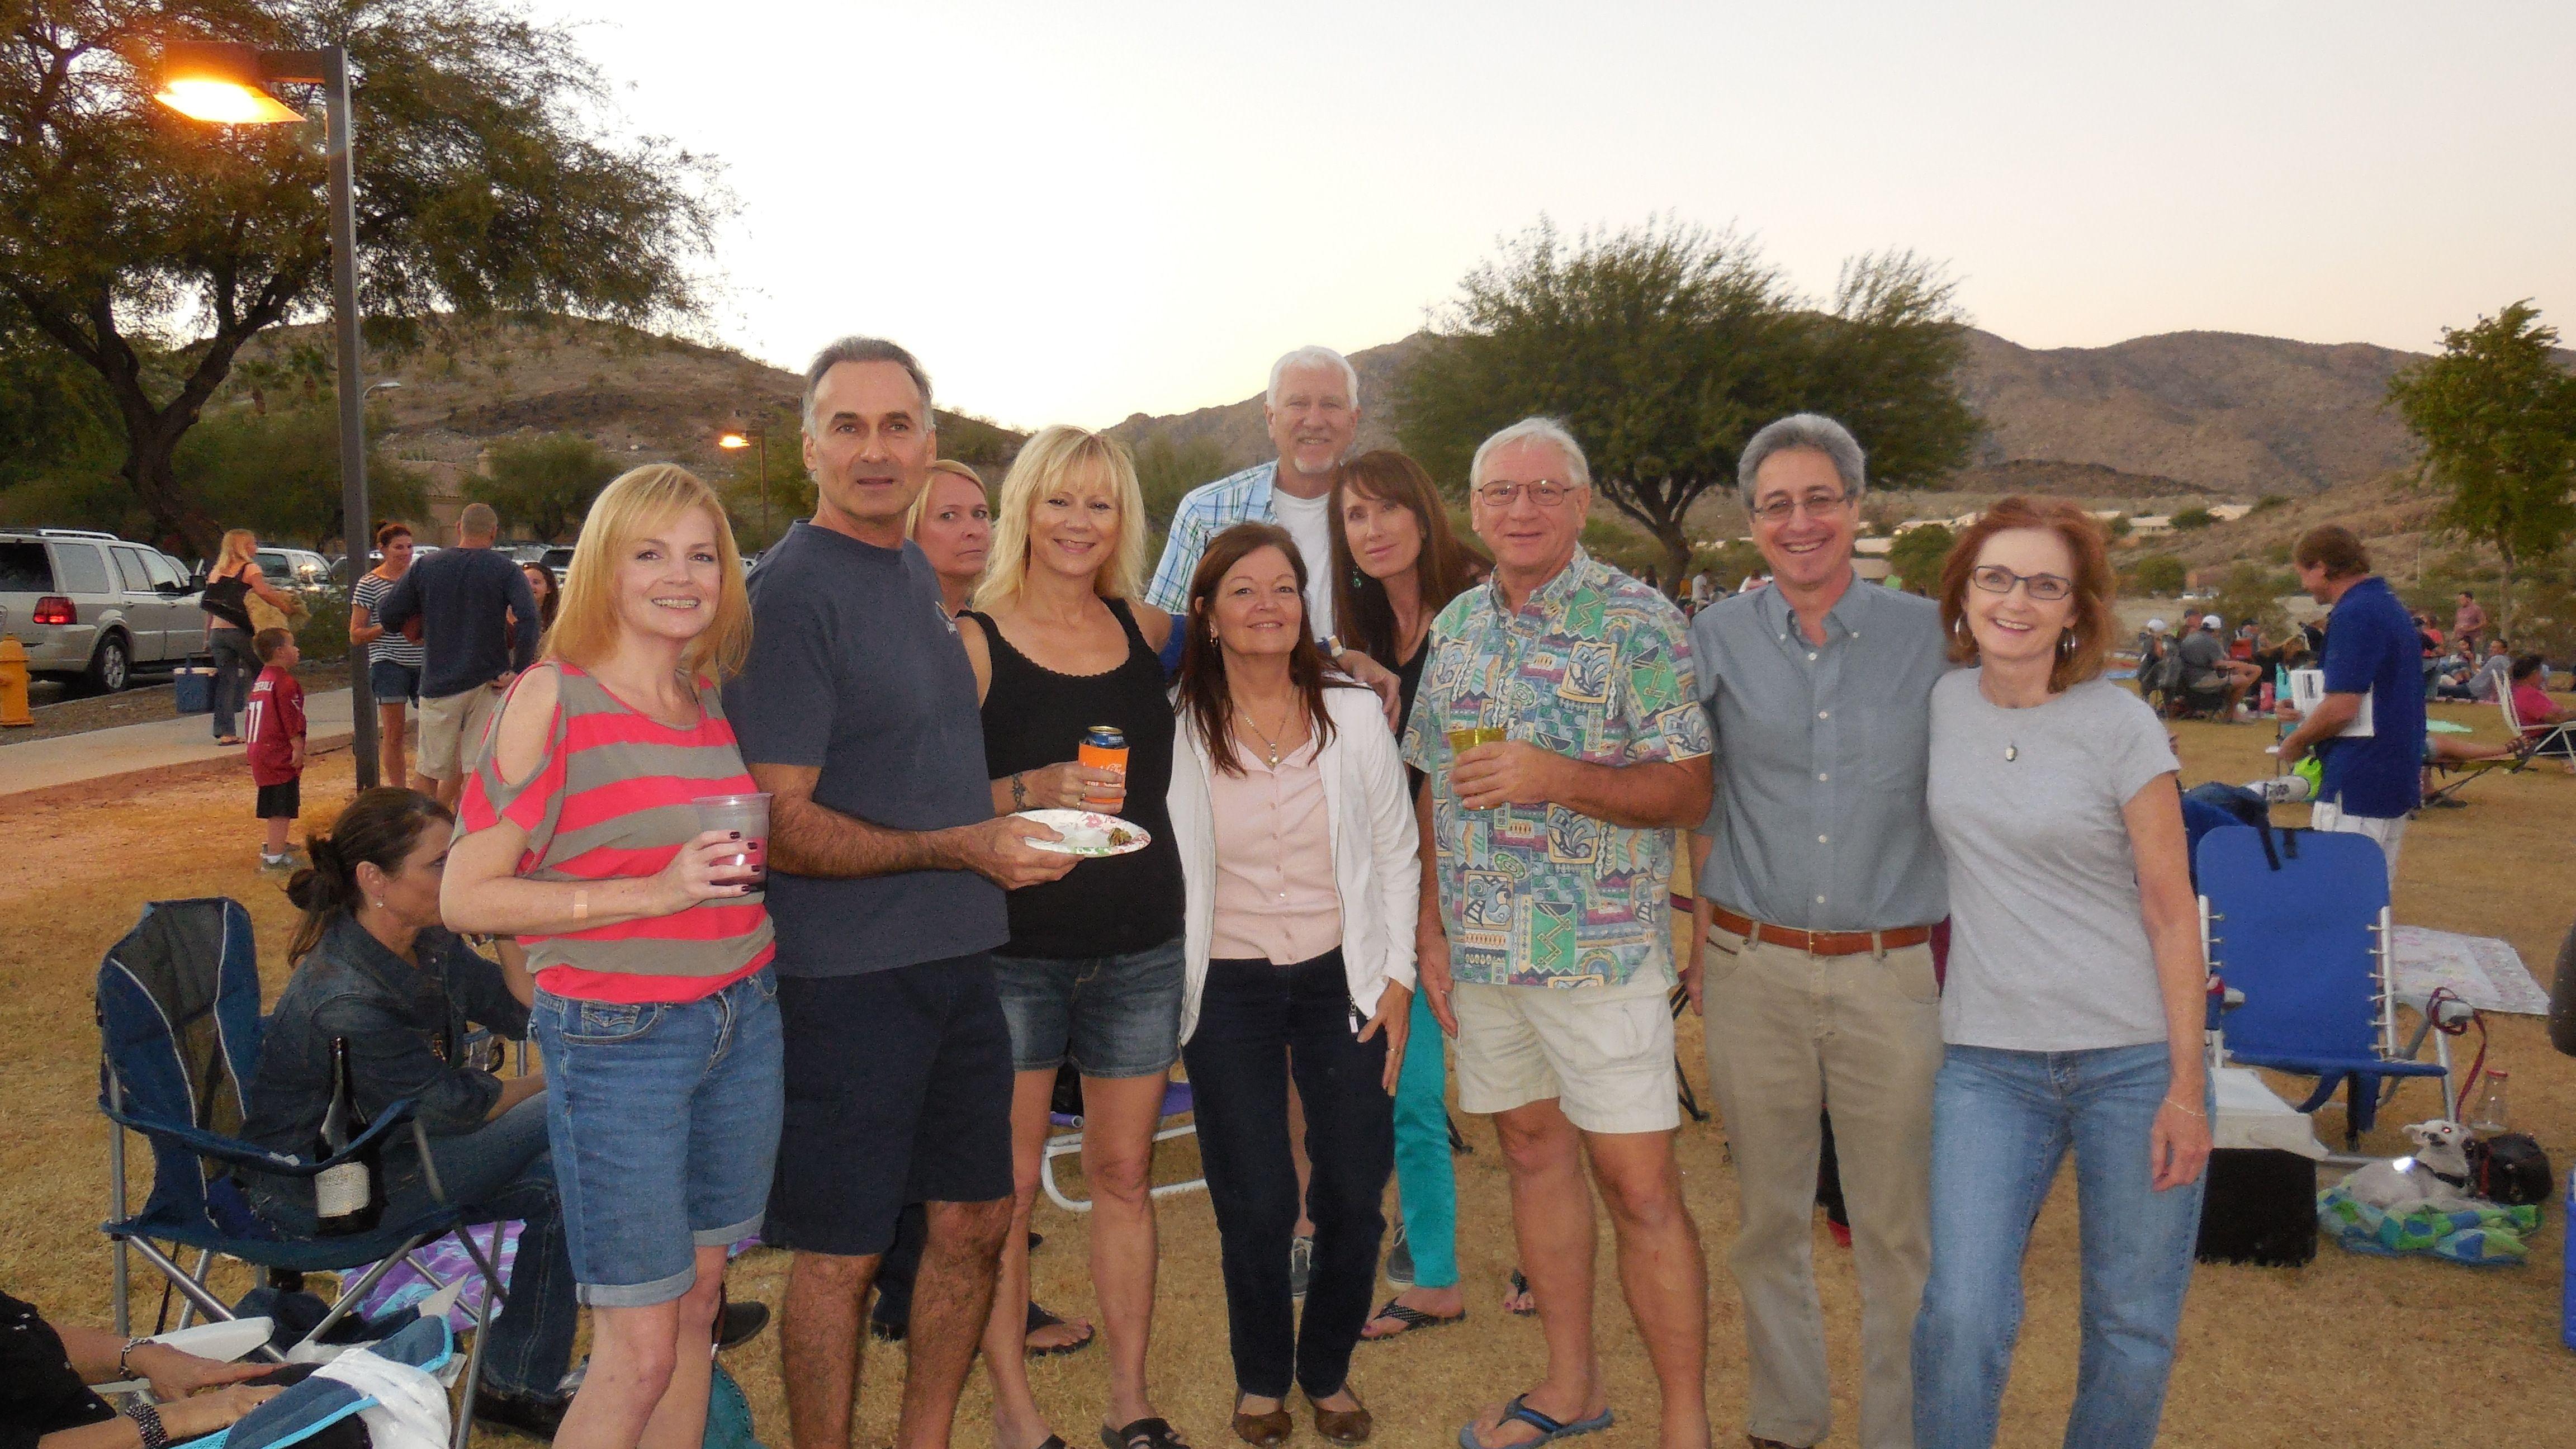 Singles euchre club in arizona